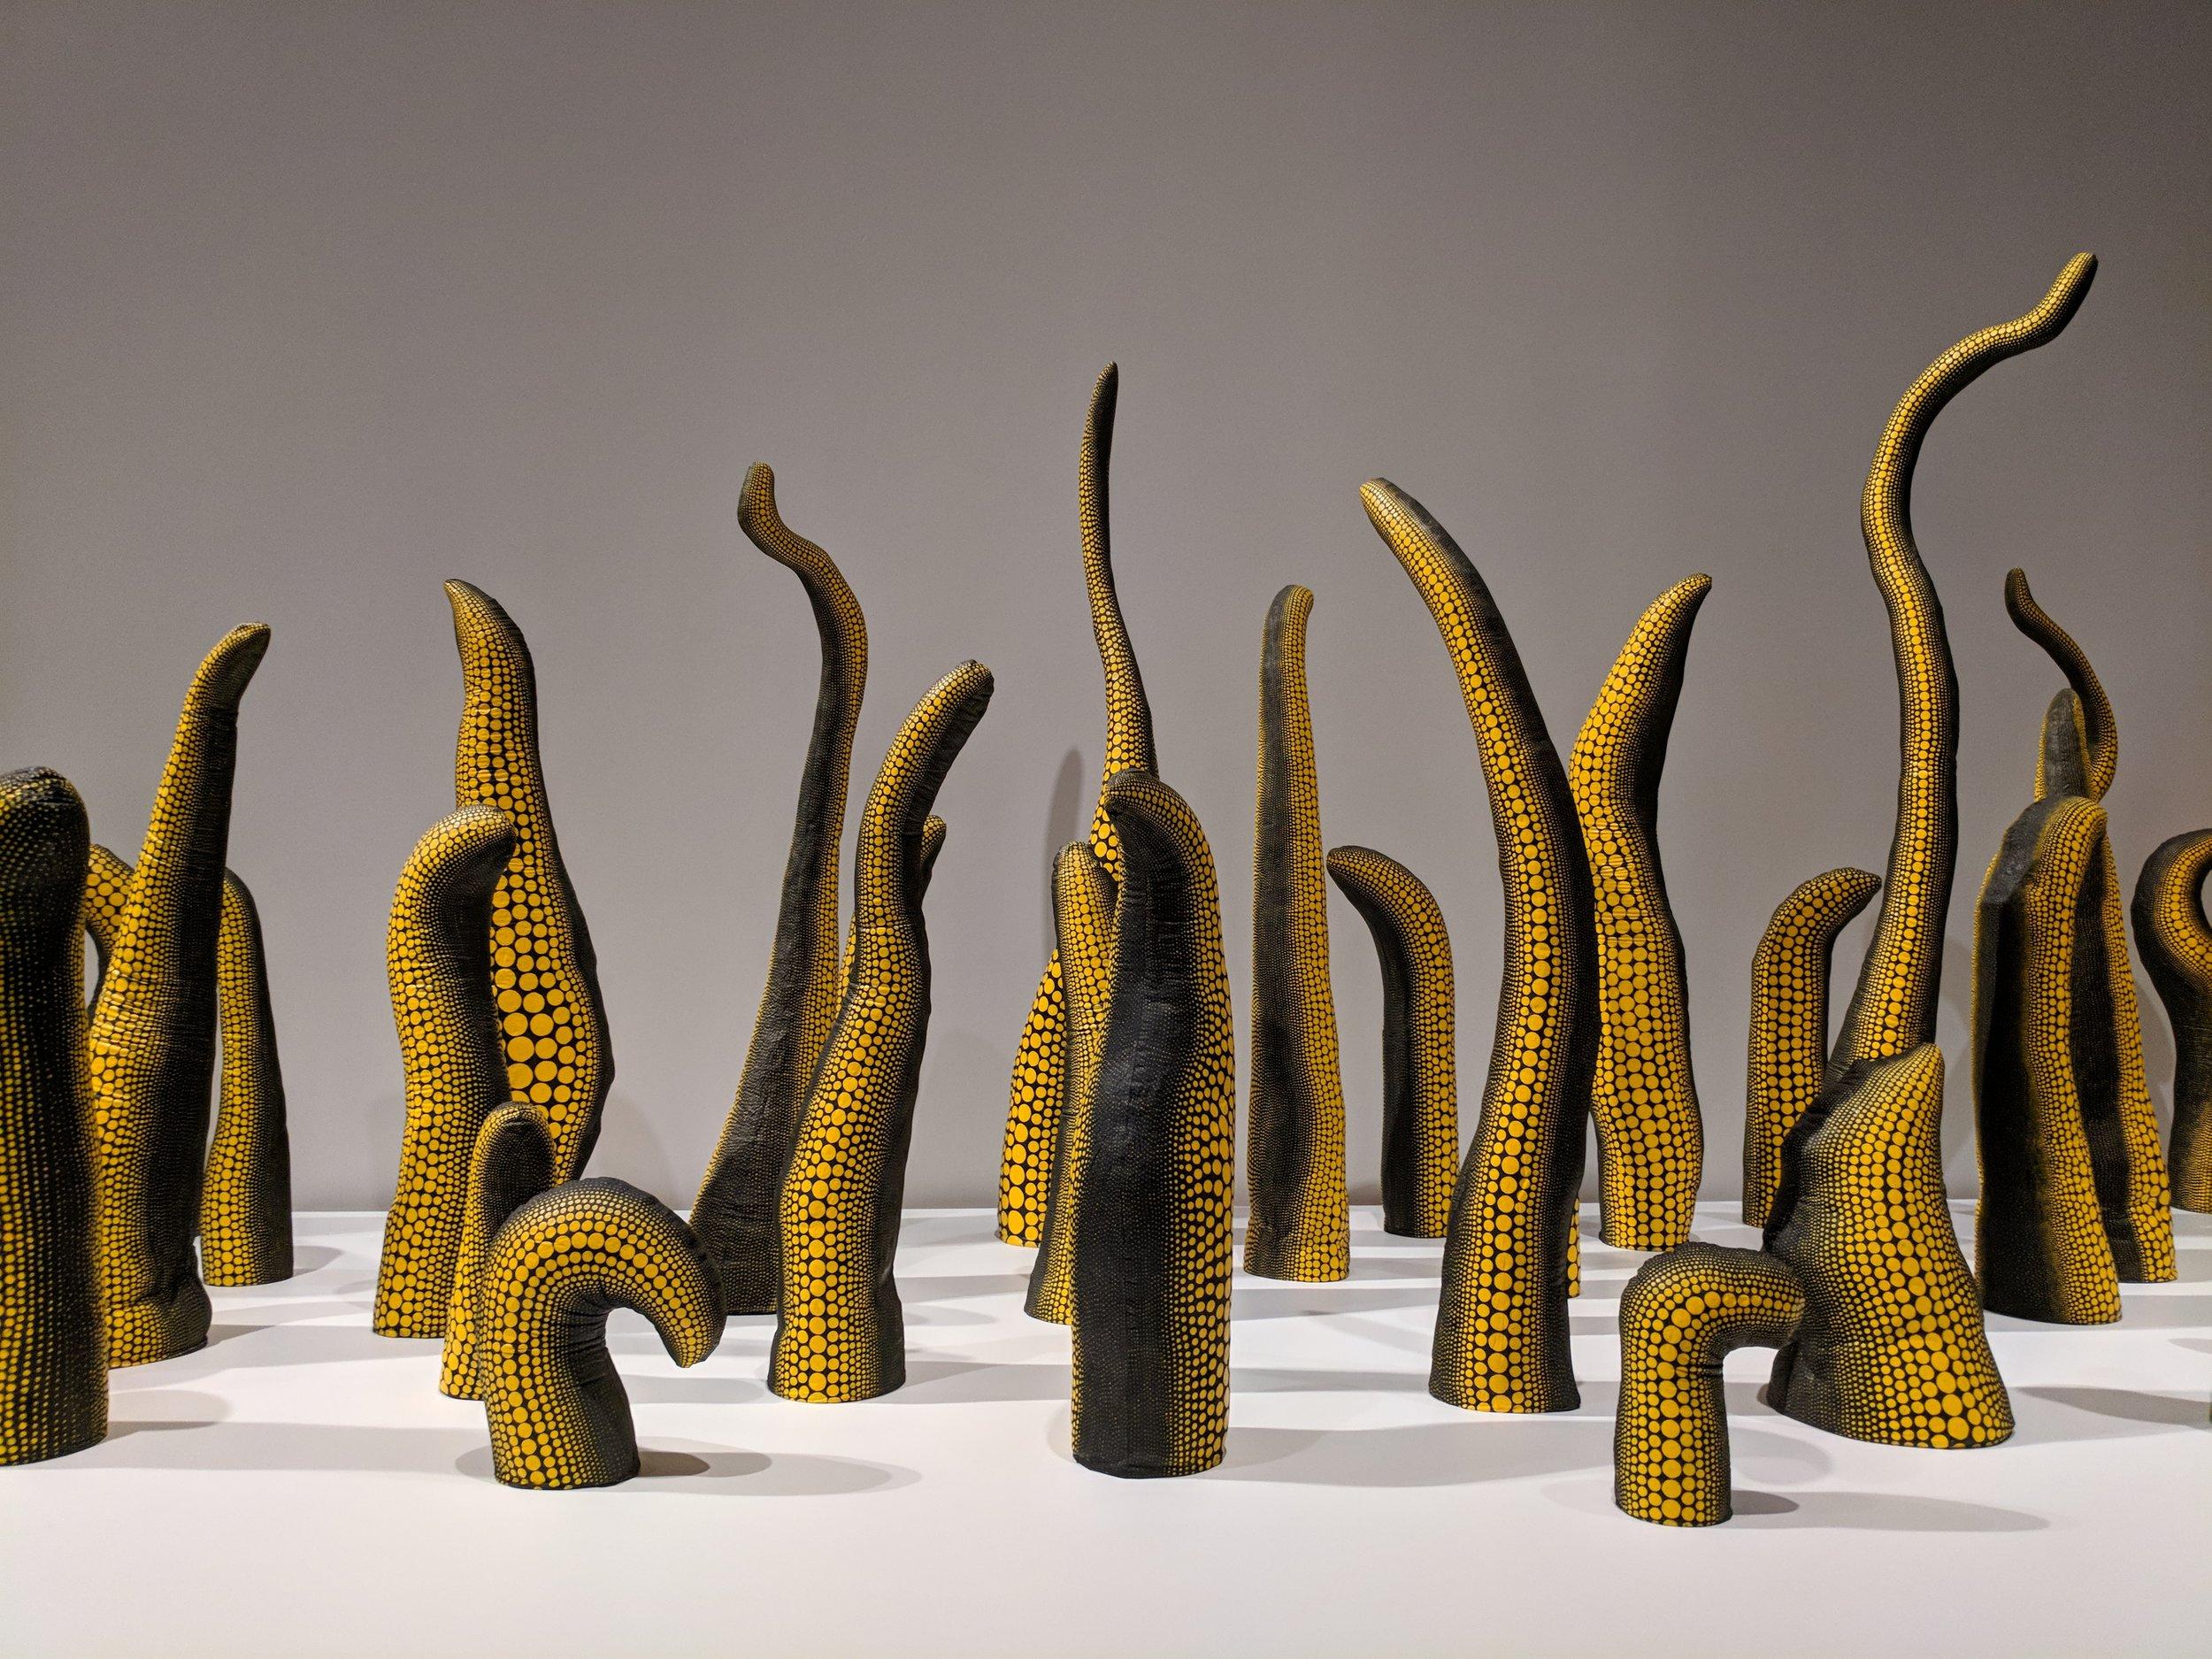 Yayoi Kusama, Life (Repetitive Vision), 1998